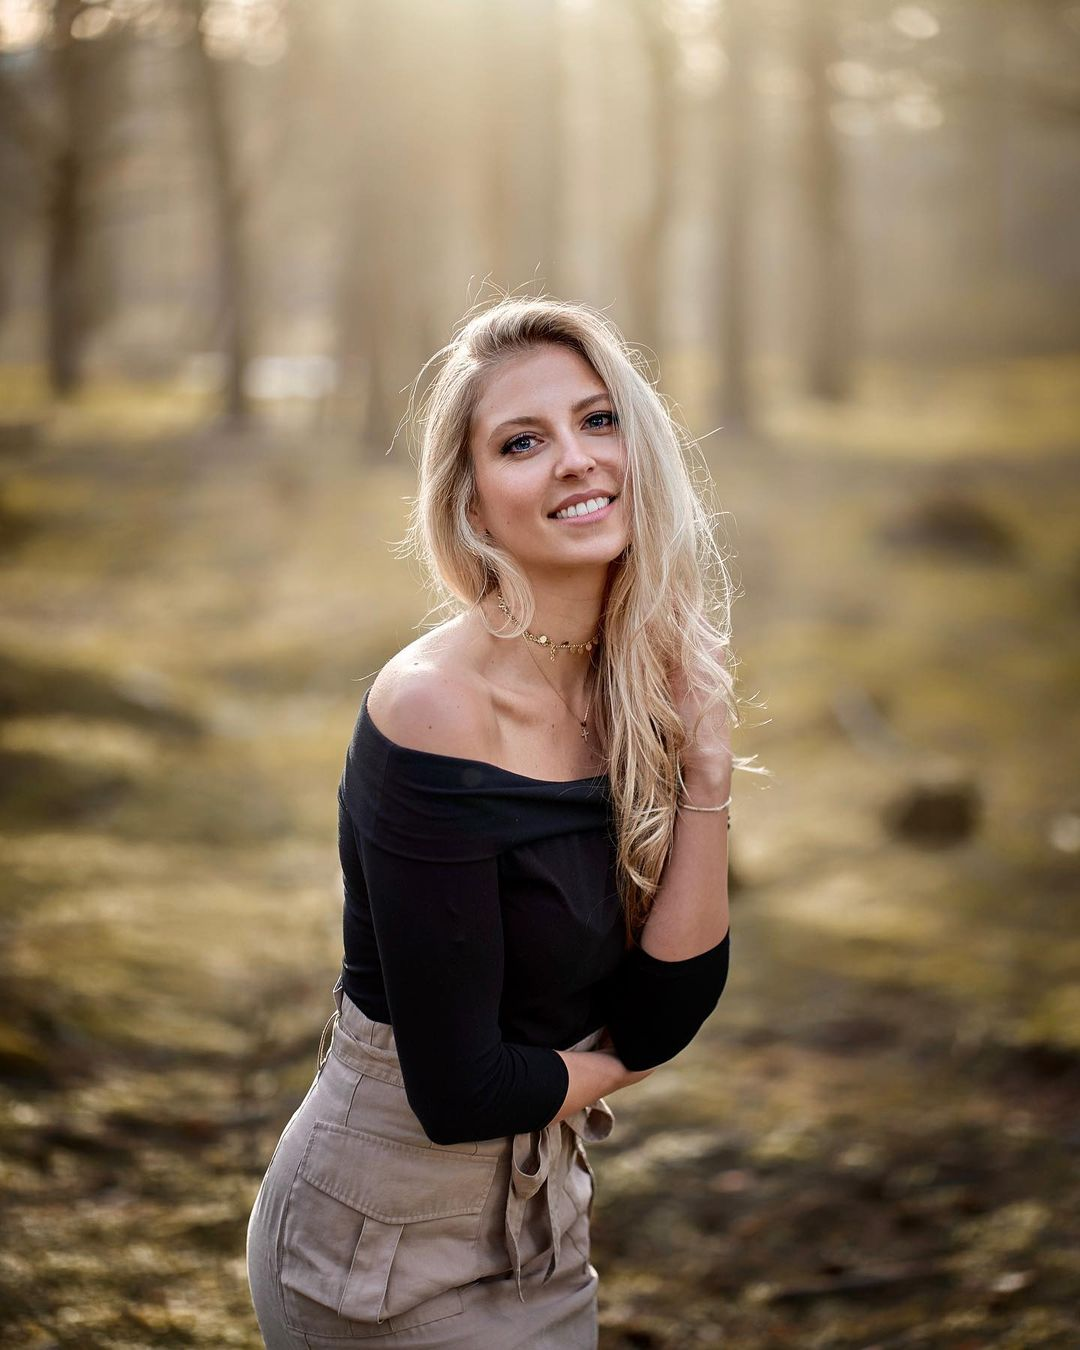 Lea-Manuela-Wallpapers-Insta-Fit-Bio-3